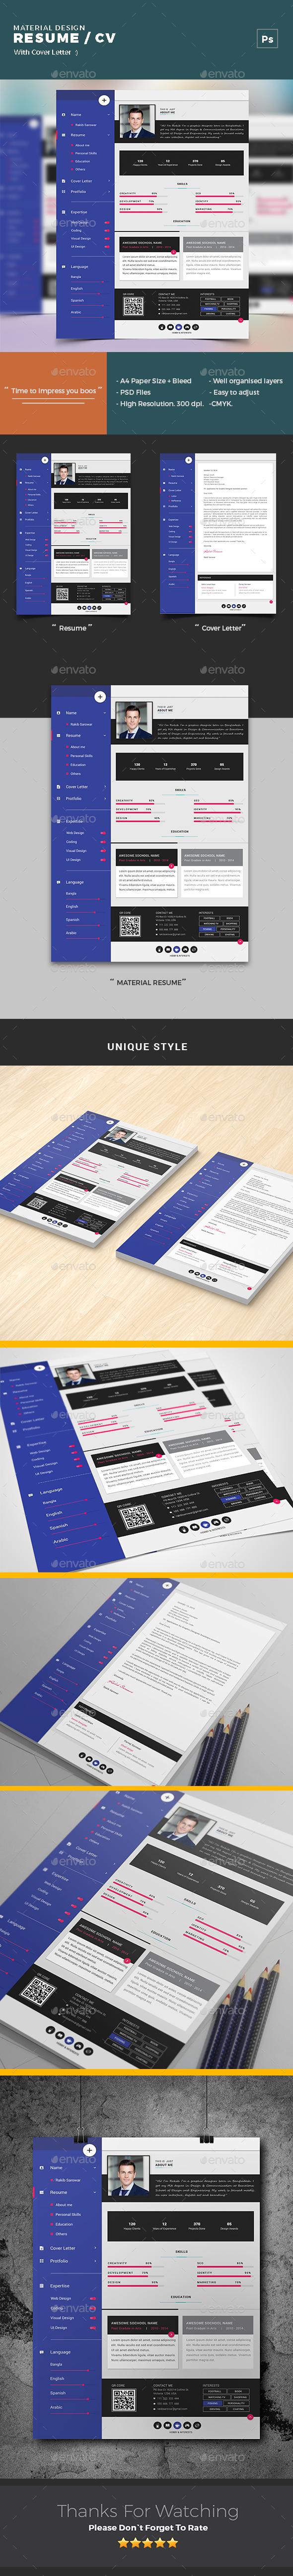 Material Design Resume/ CV